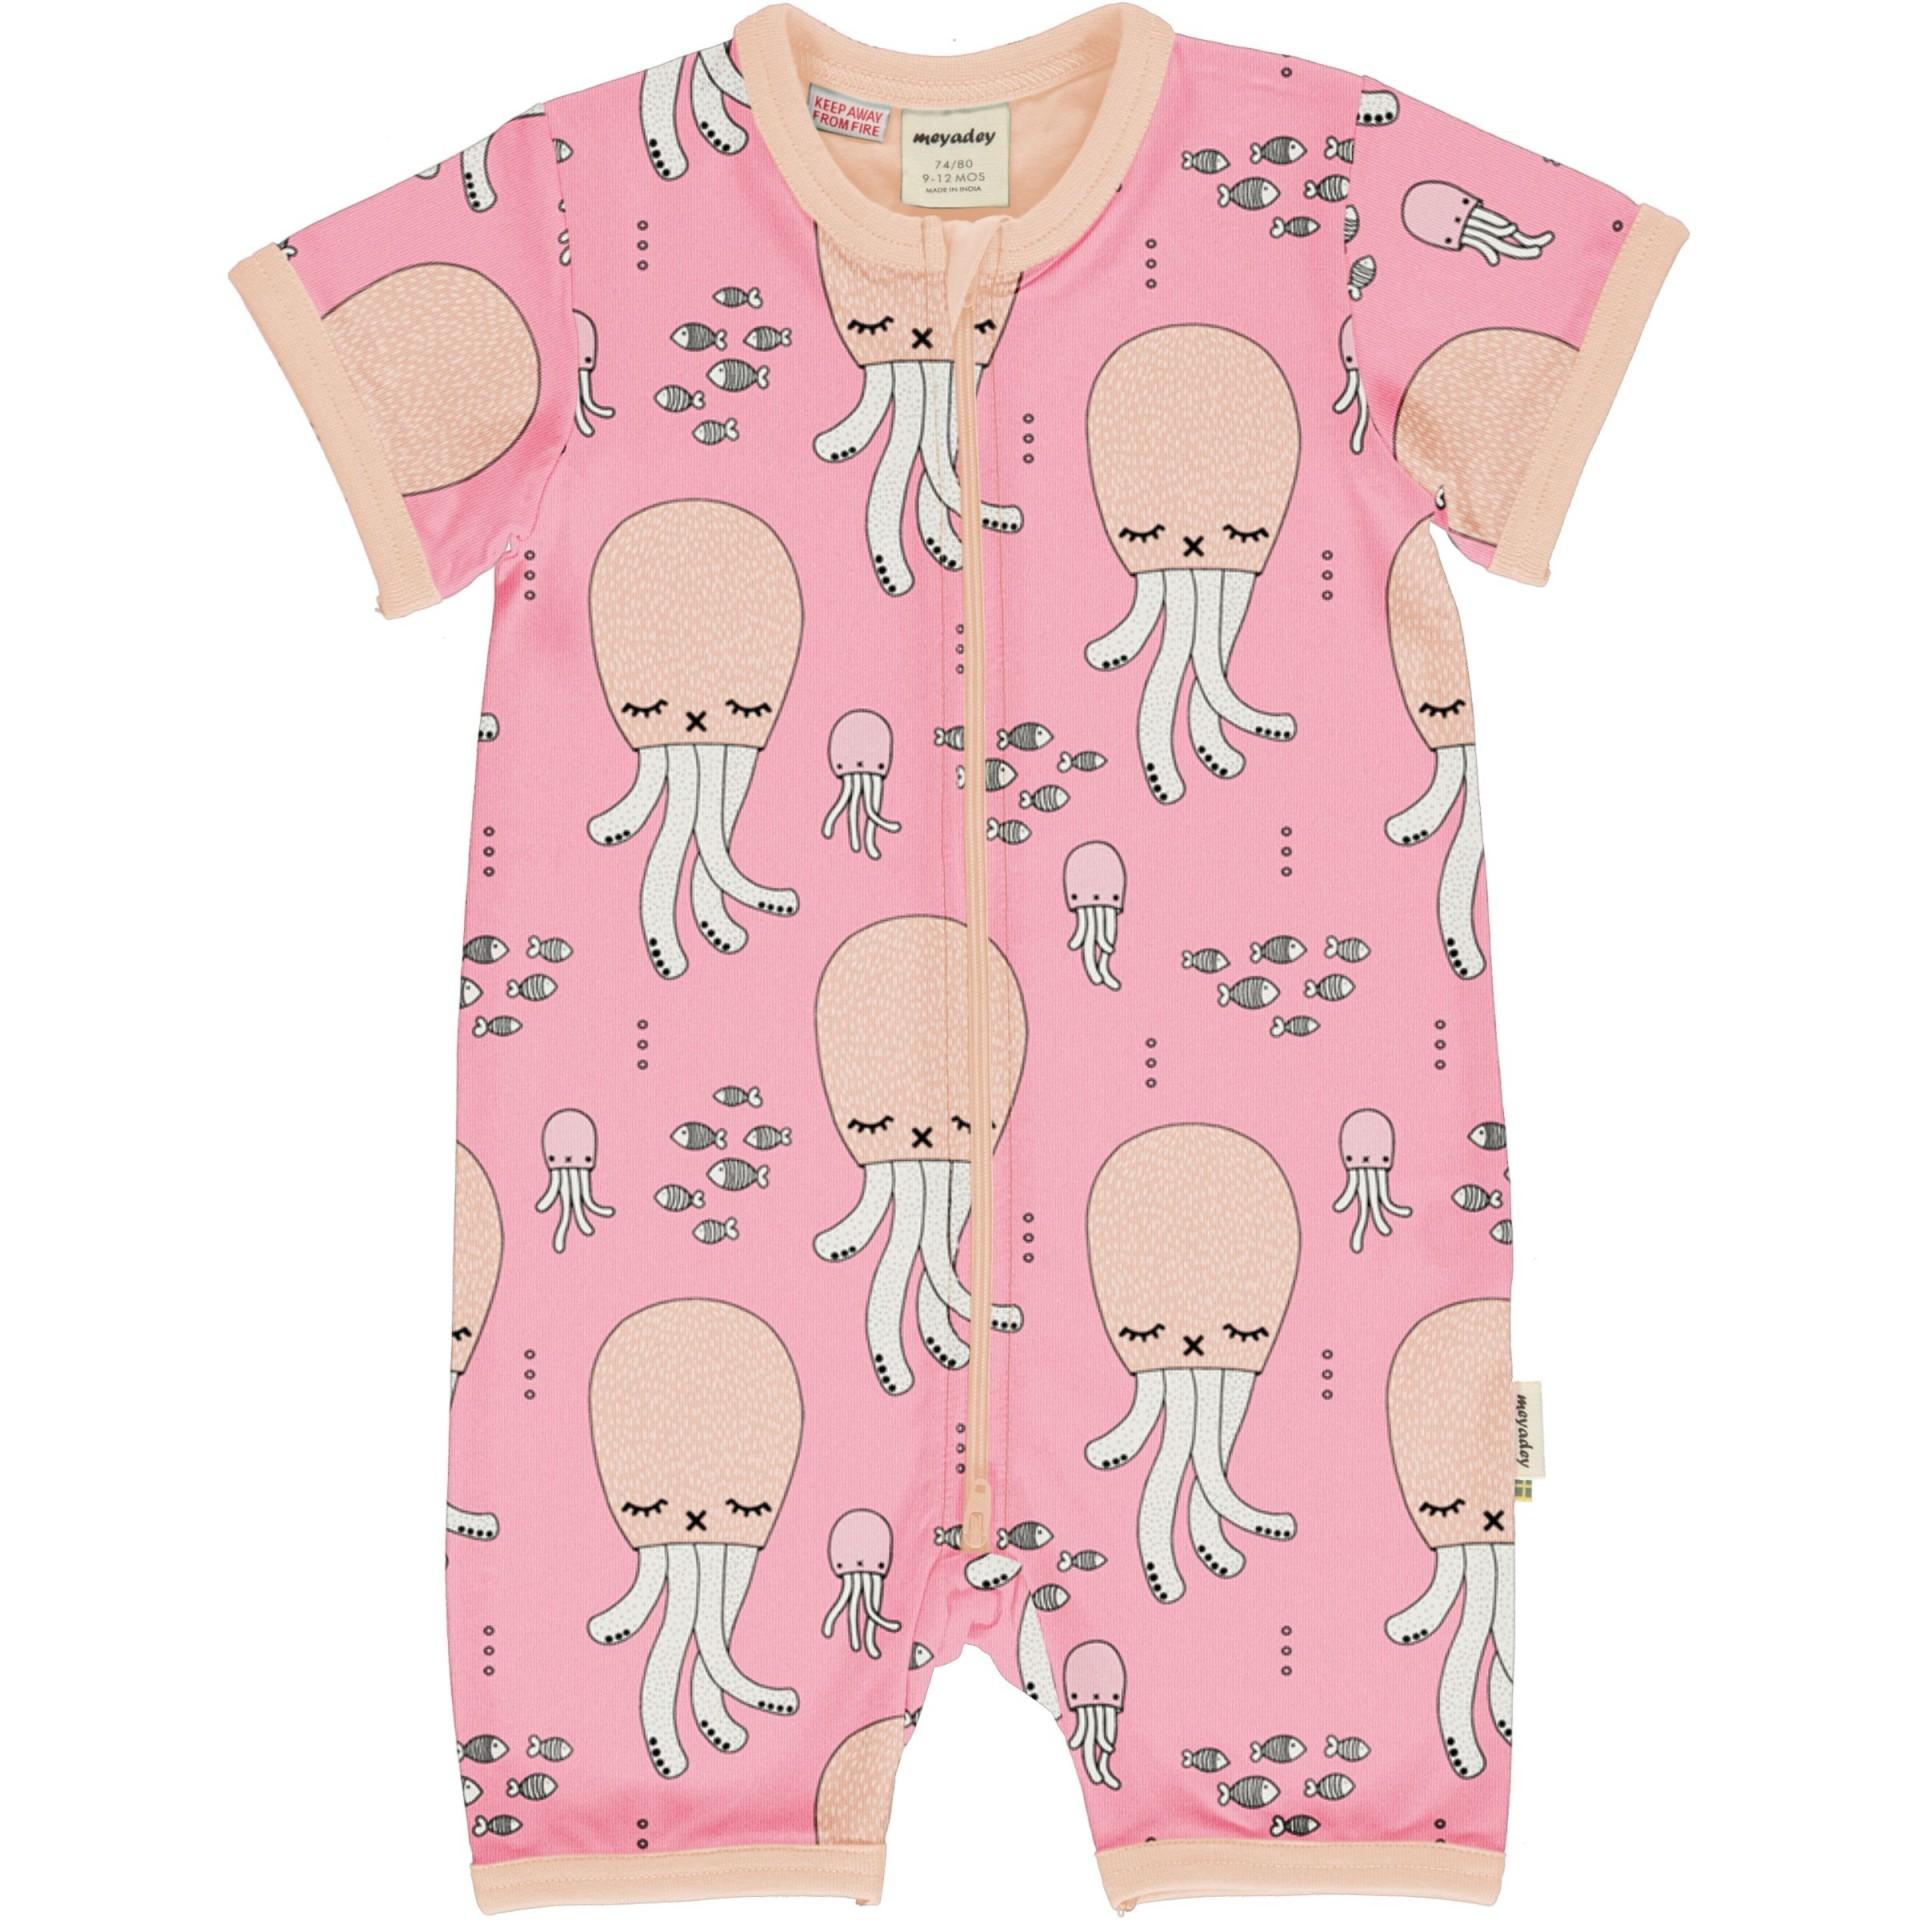 Fato com zip Cute Squid Meyaday (Tamanhos disponíveis 9-12m, 18-24m)